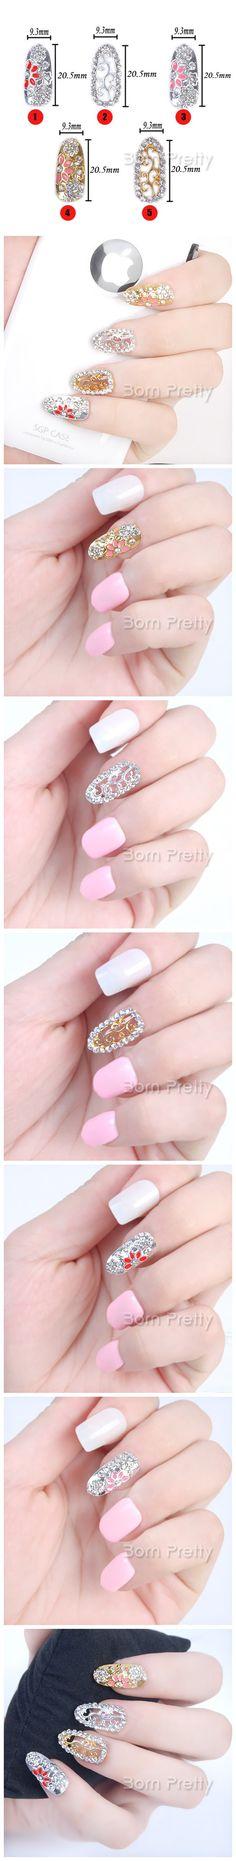 $2.92 3Pcs Shiny Retro-style Hollowed-out Rhinestoned Design Full Nail Stud 3D Nail Art Jewelry Decoration - BornPrettyStore.com